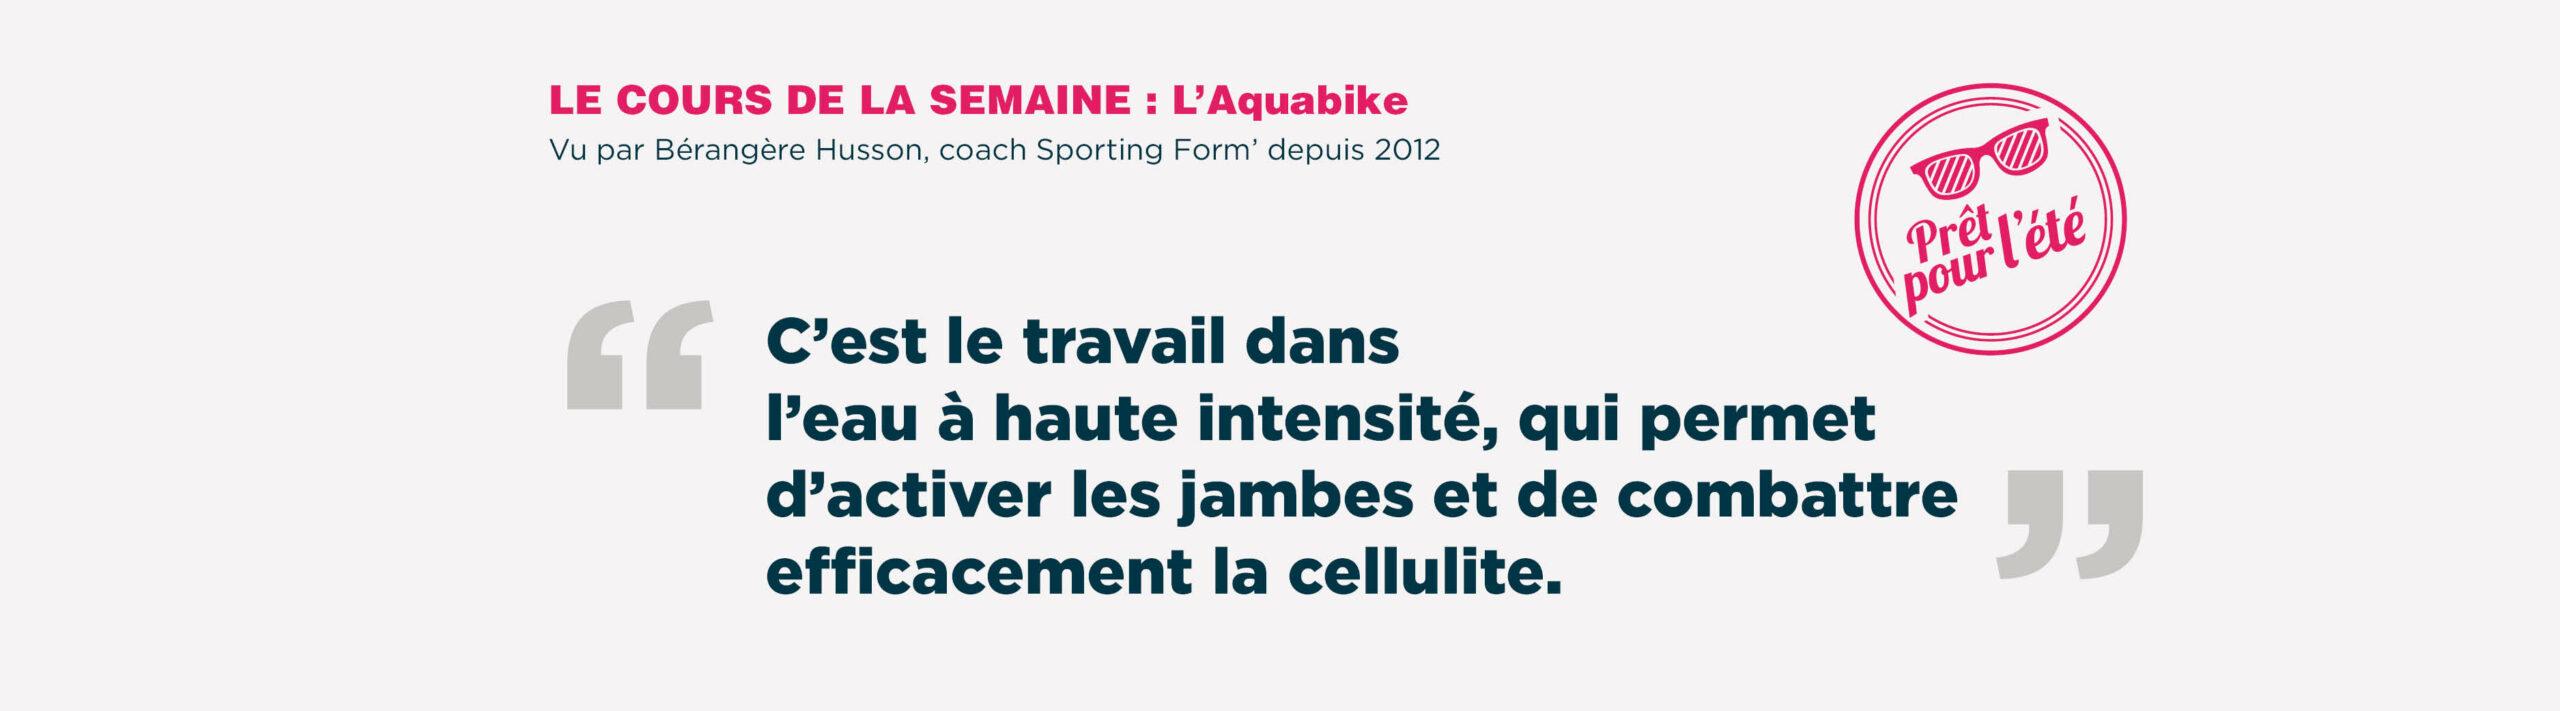 Cours Aquabike - Sporting Form'